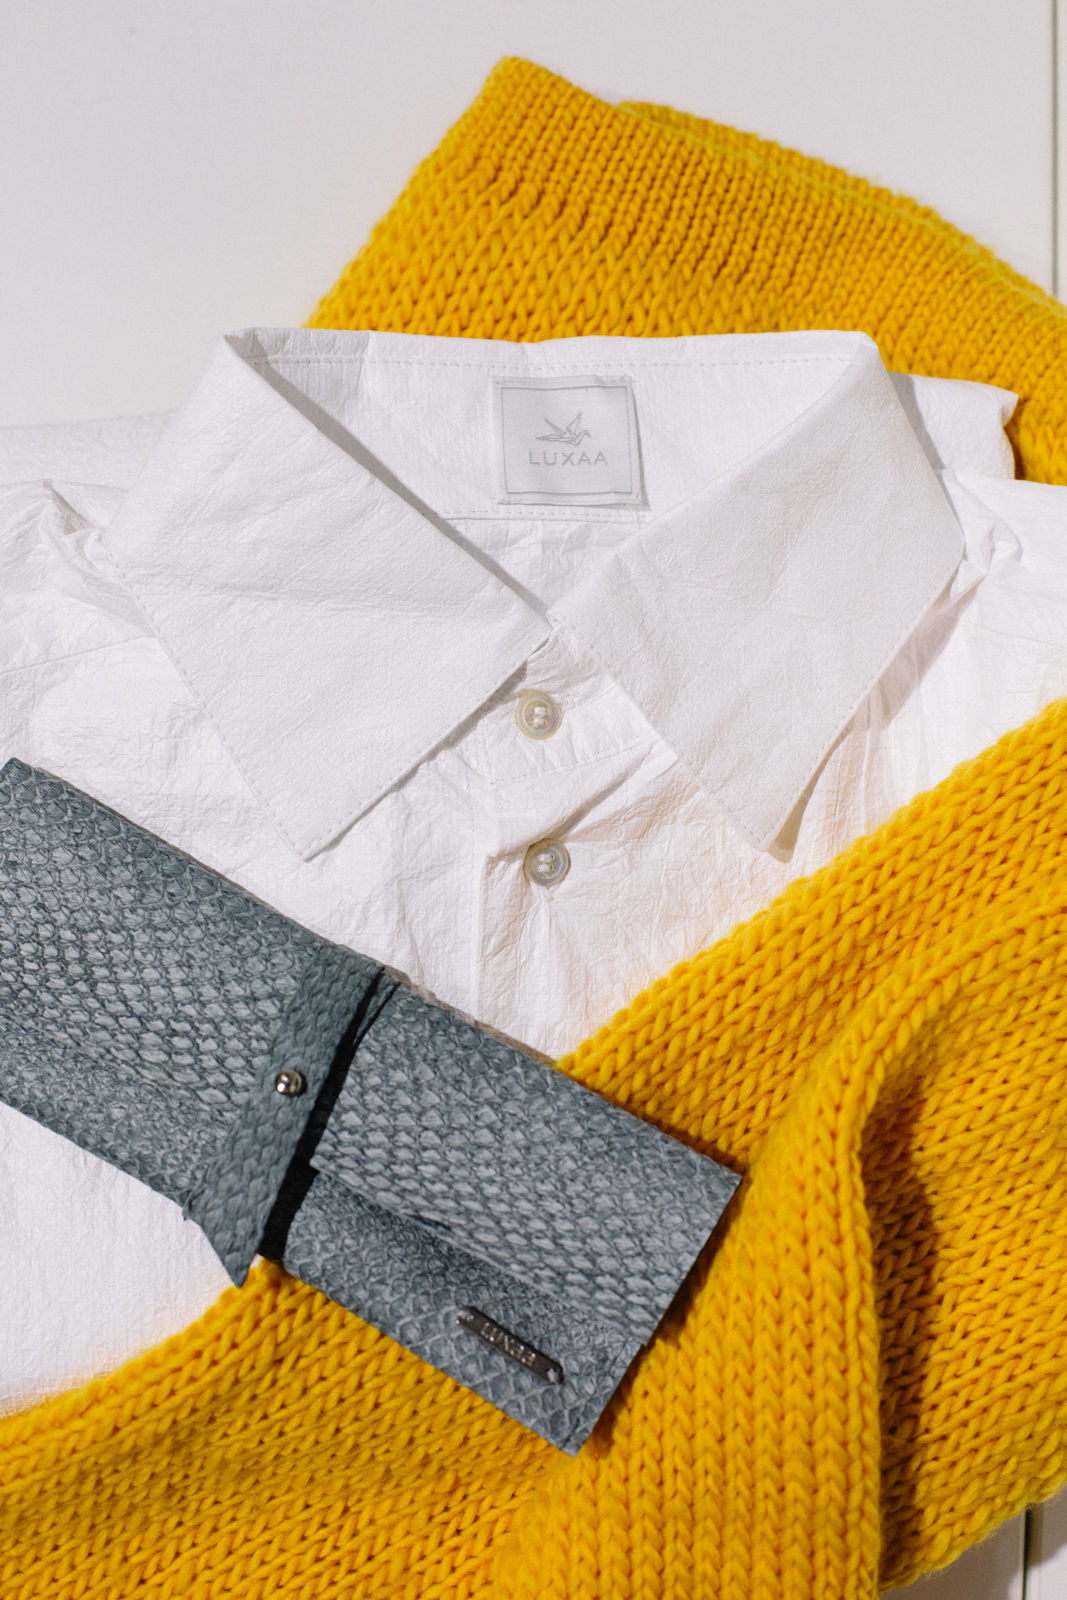 innovation-sustainable-fashion.jpg